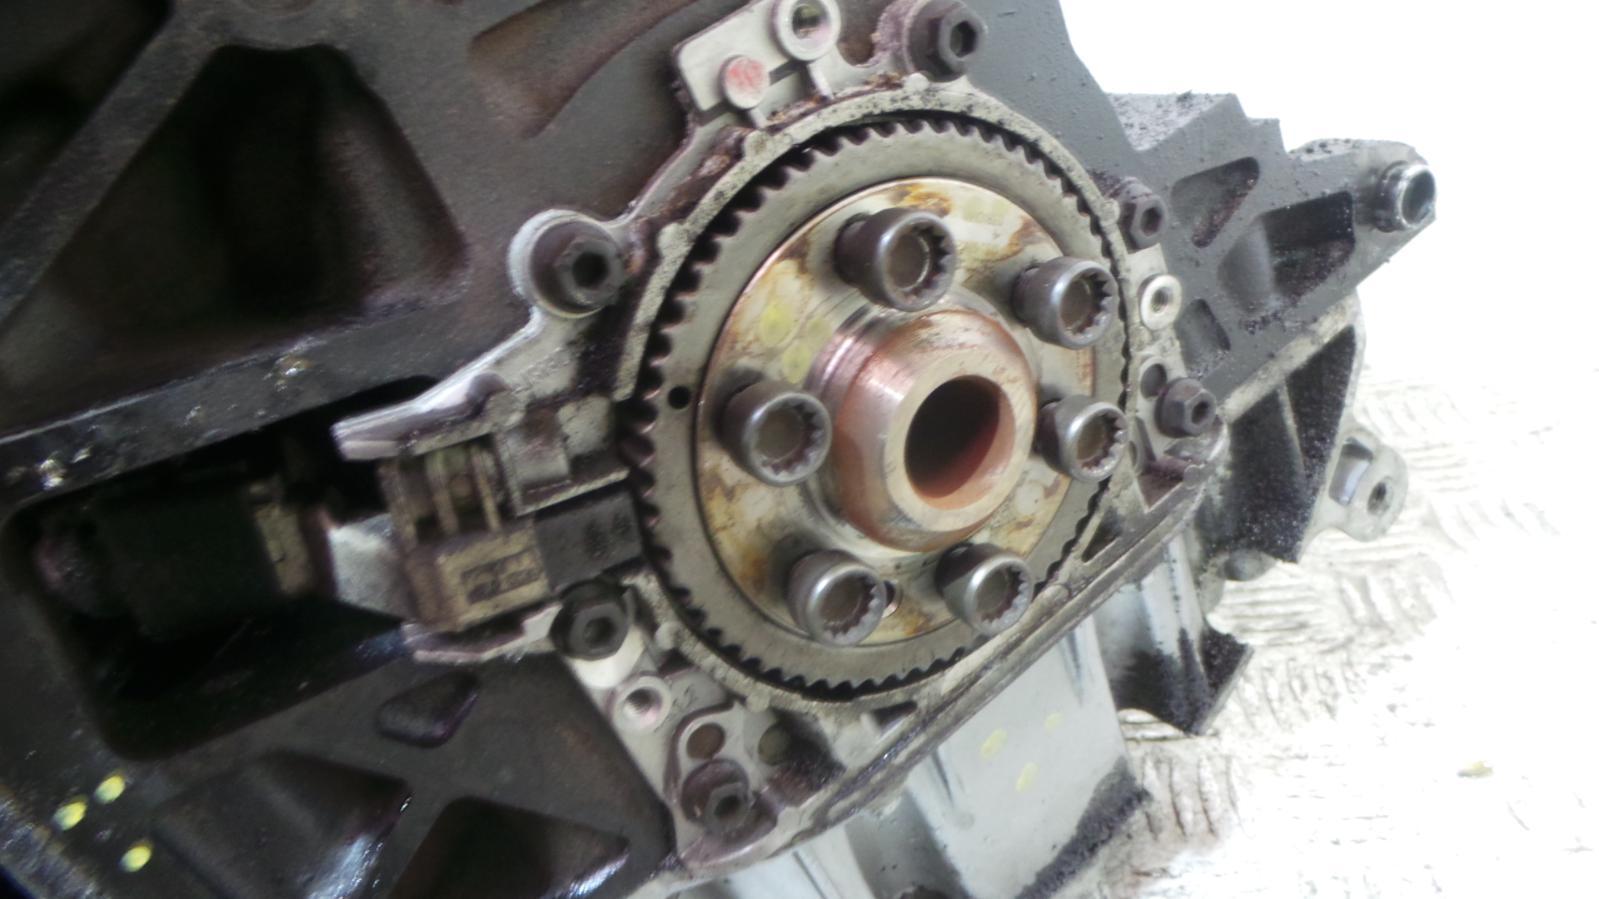 Try These Vw Passat B6 2 0 Tdi Engine Codes {Mahindra Racing}